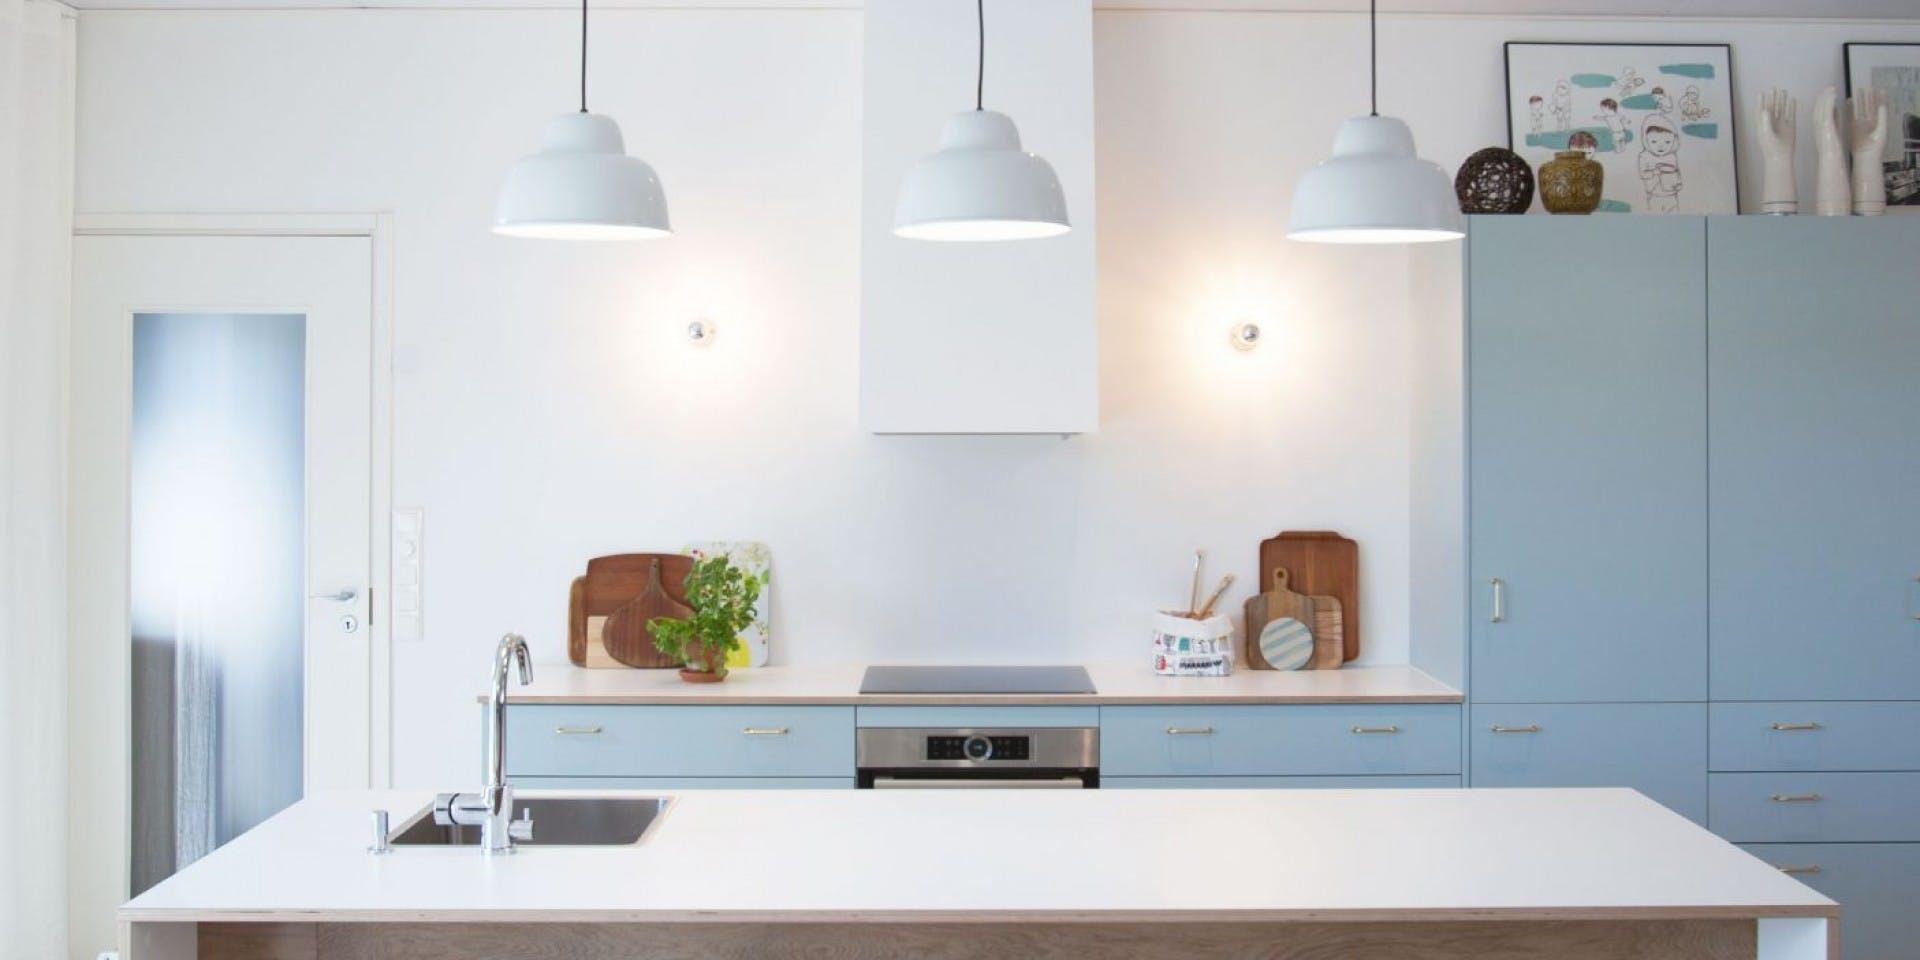 Kitchen Refresh Tikkurila Paper White paint Hero  Image